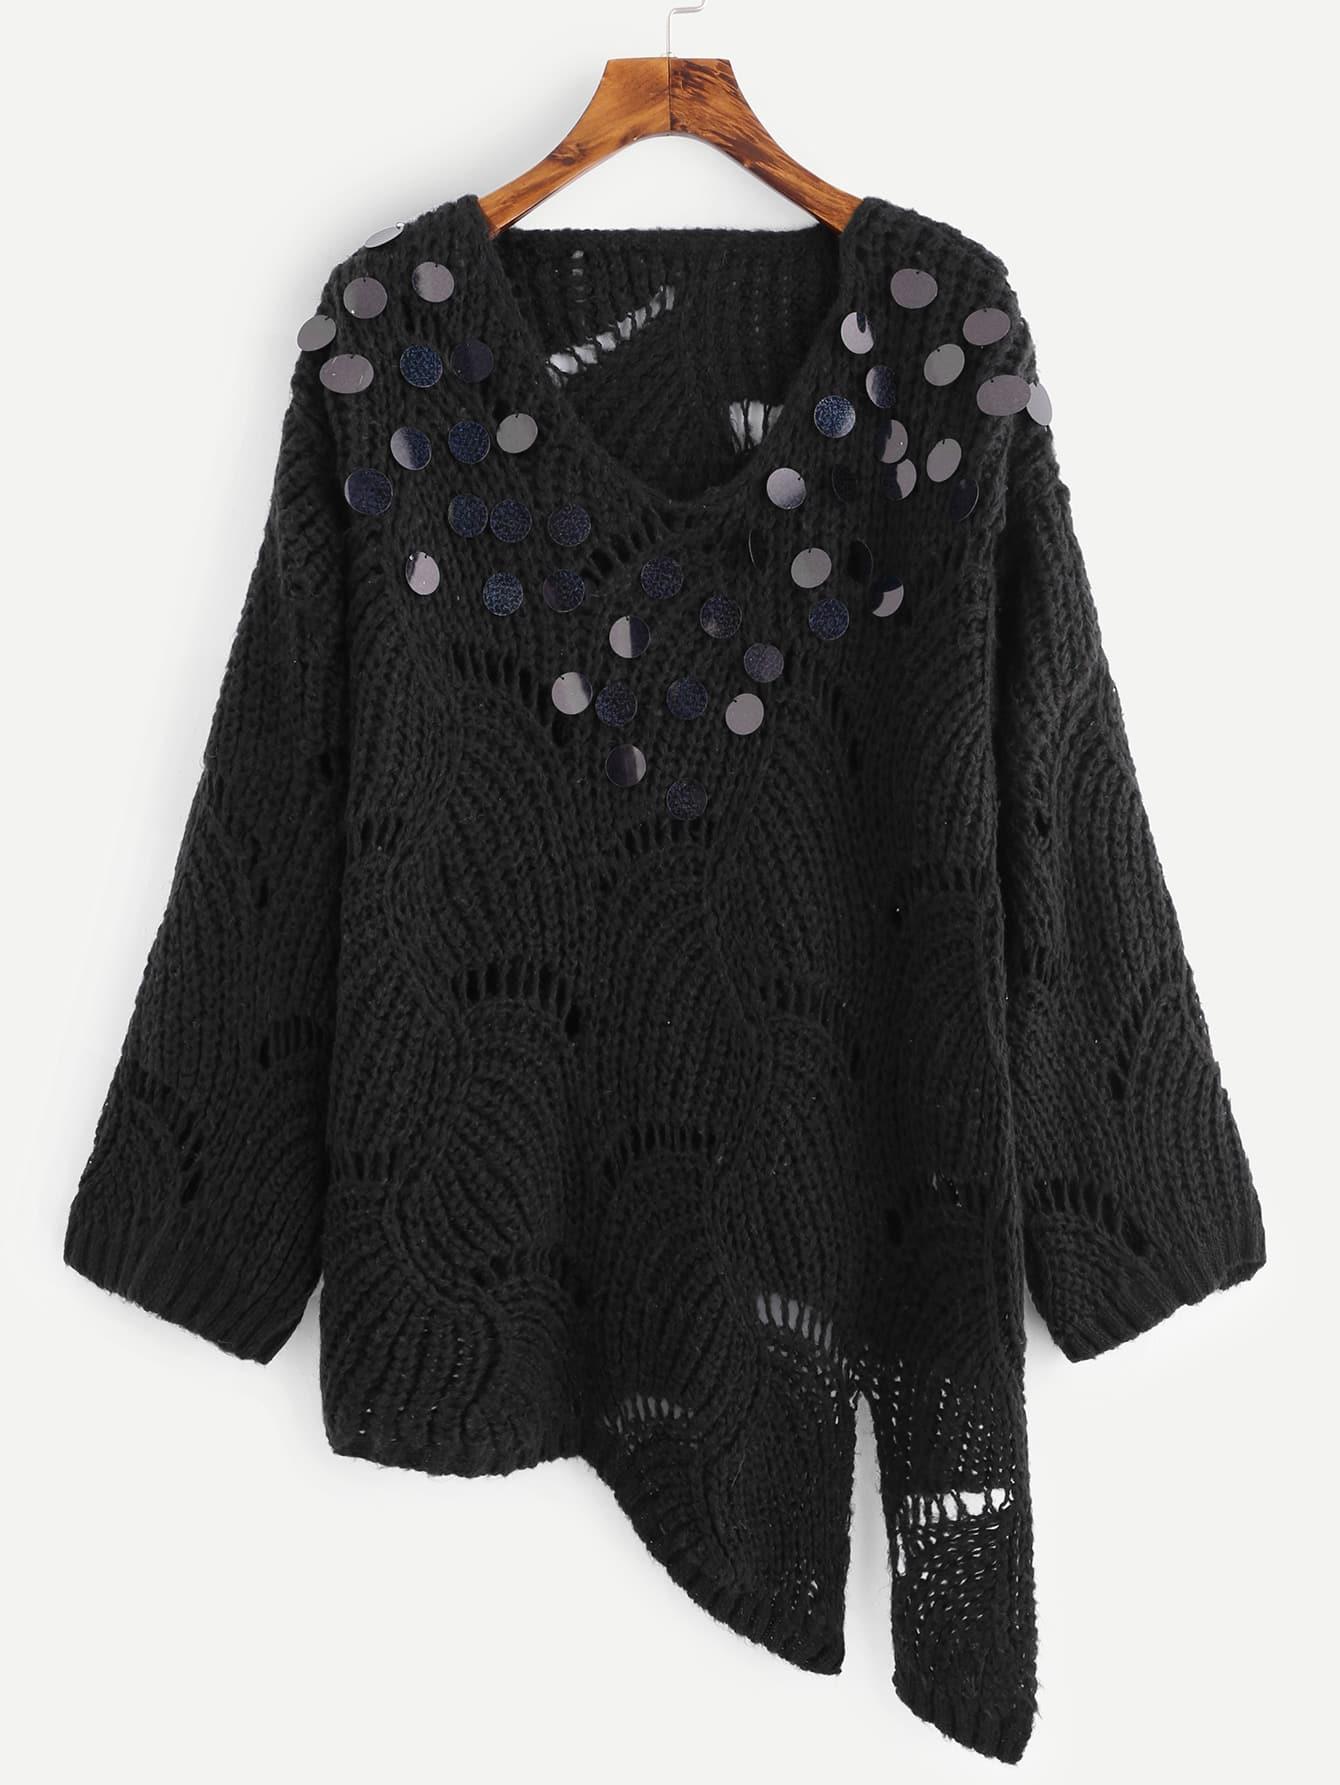 Sequin Loose Knit Asymmetrical Jumper coffee knit v neck asymmetrical hem jumper